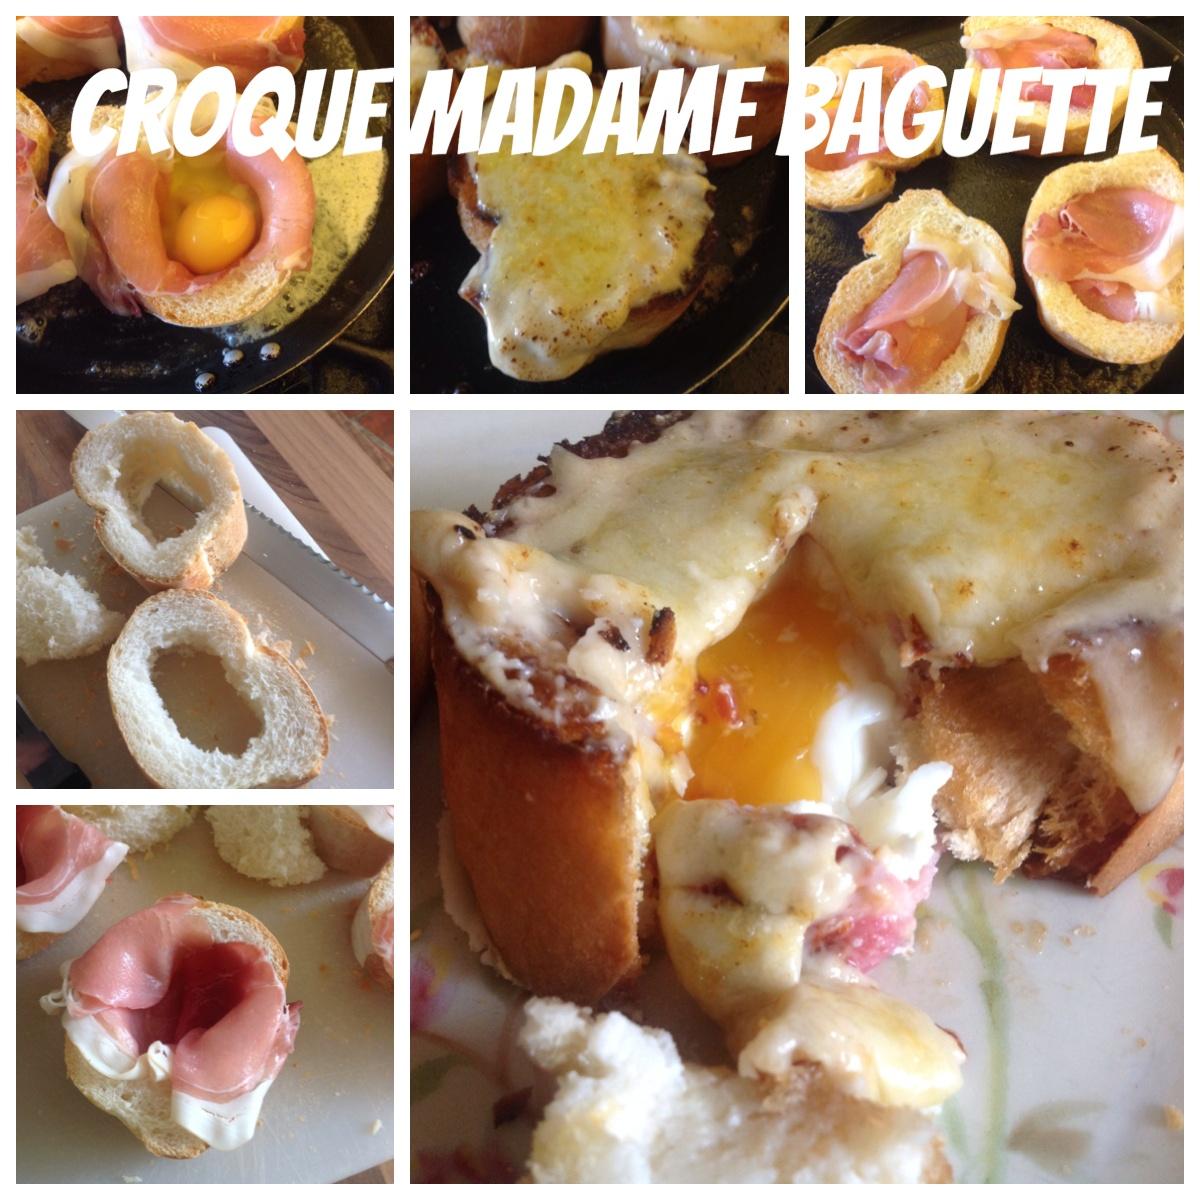 Croque Madame Baguette